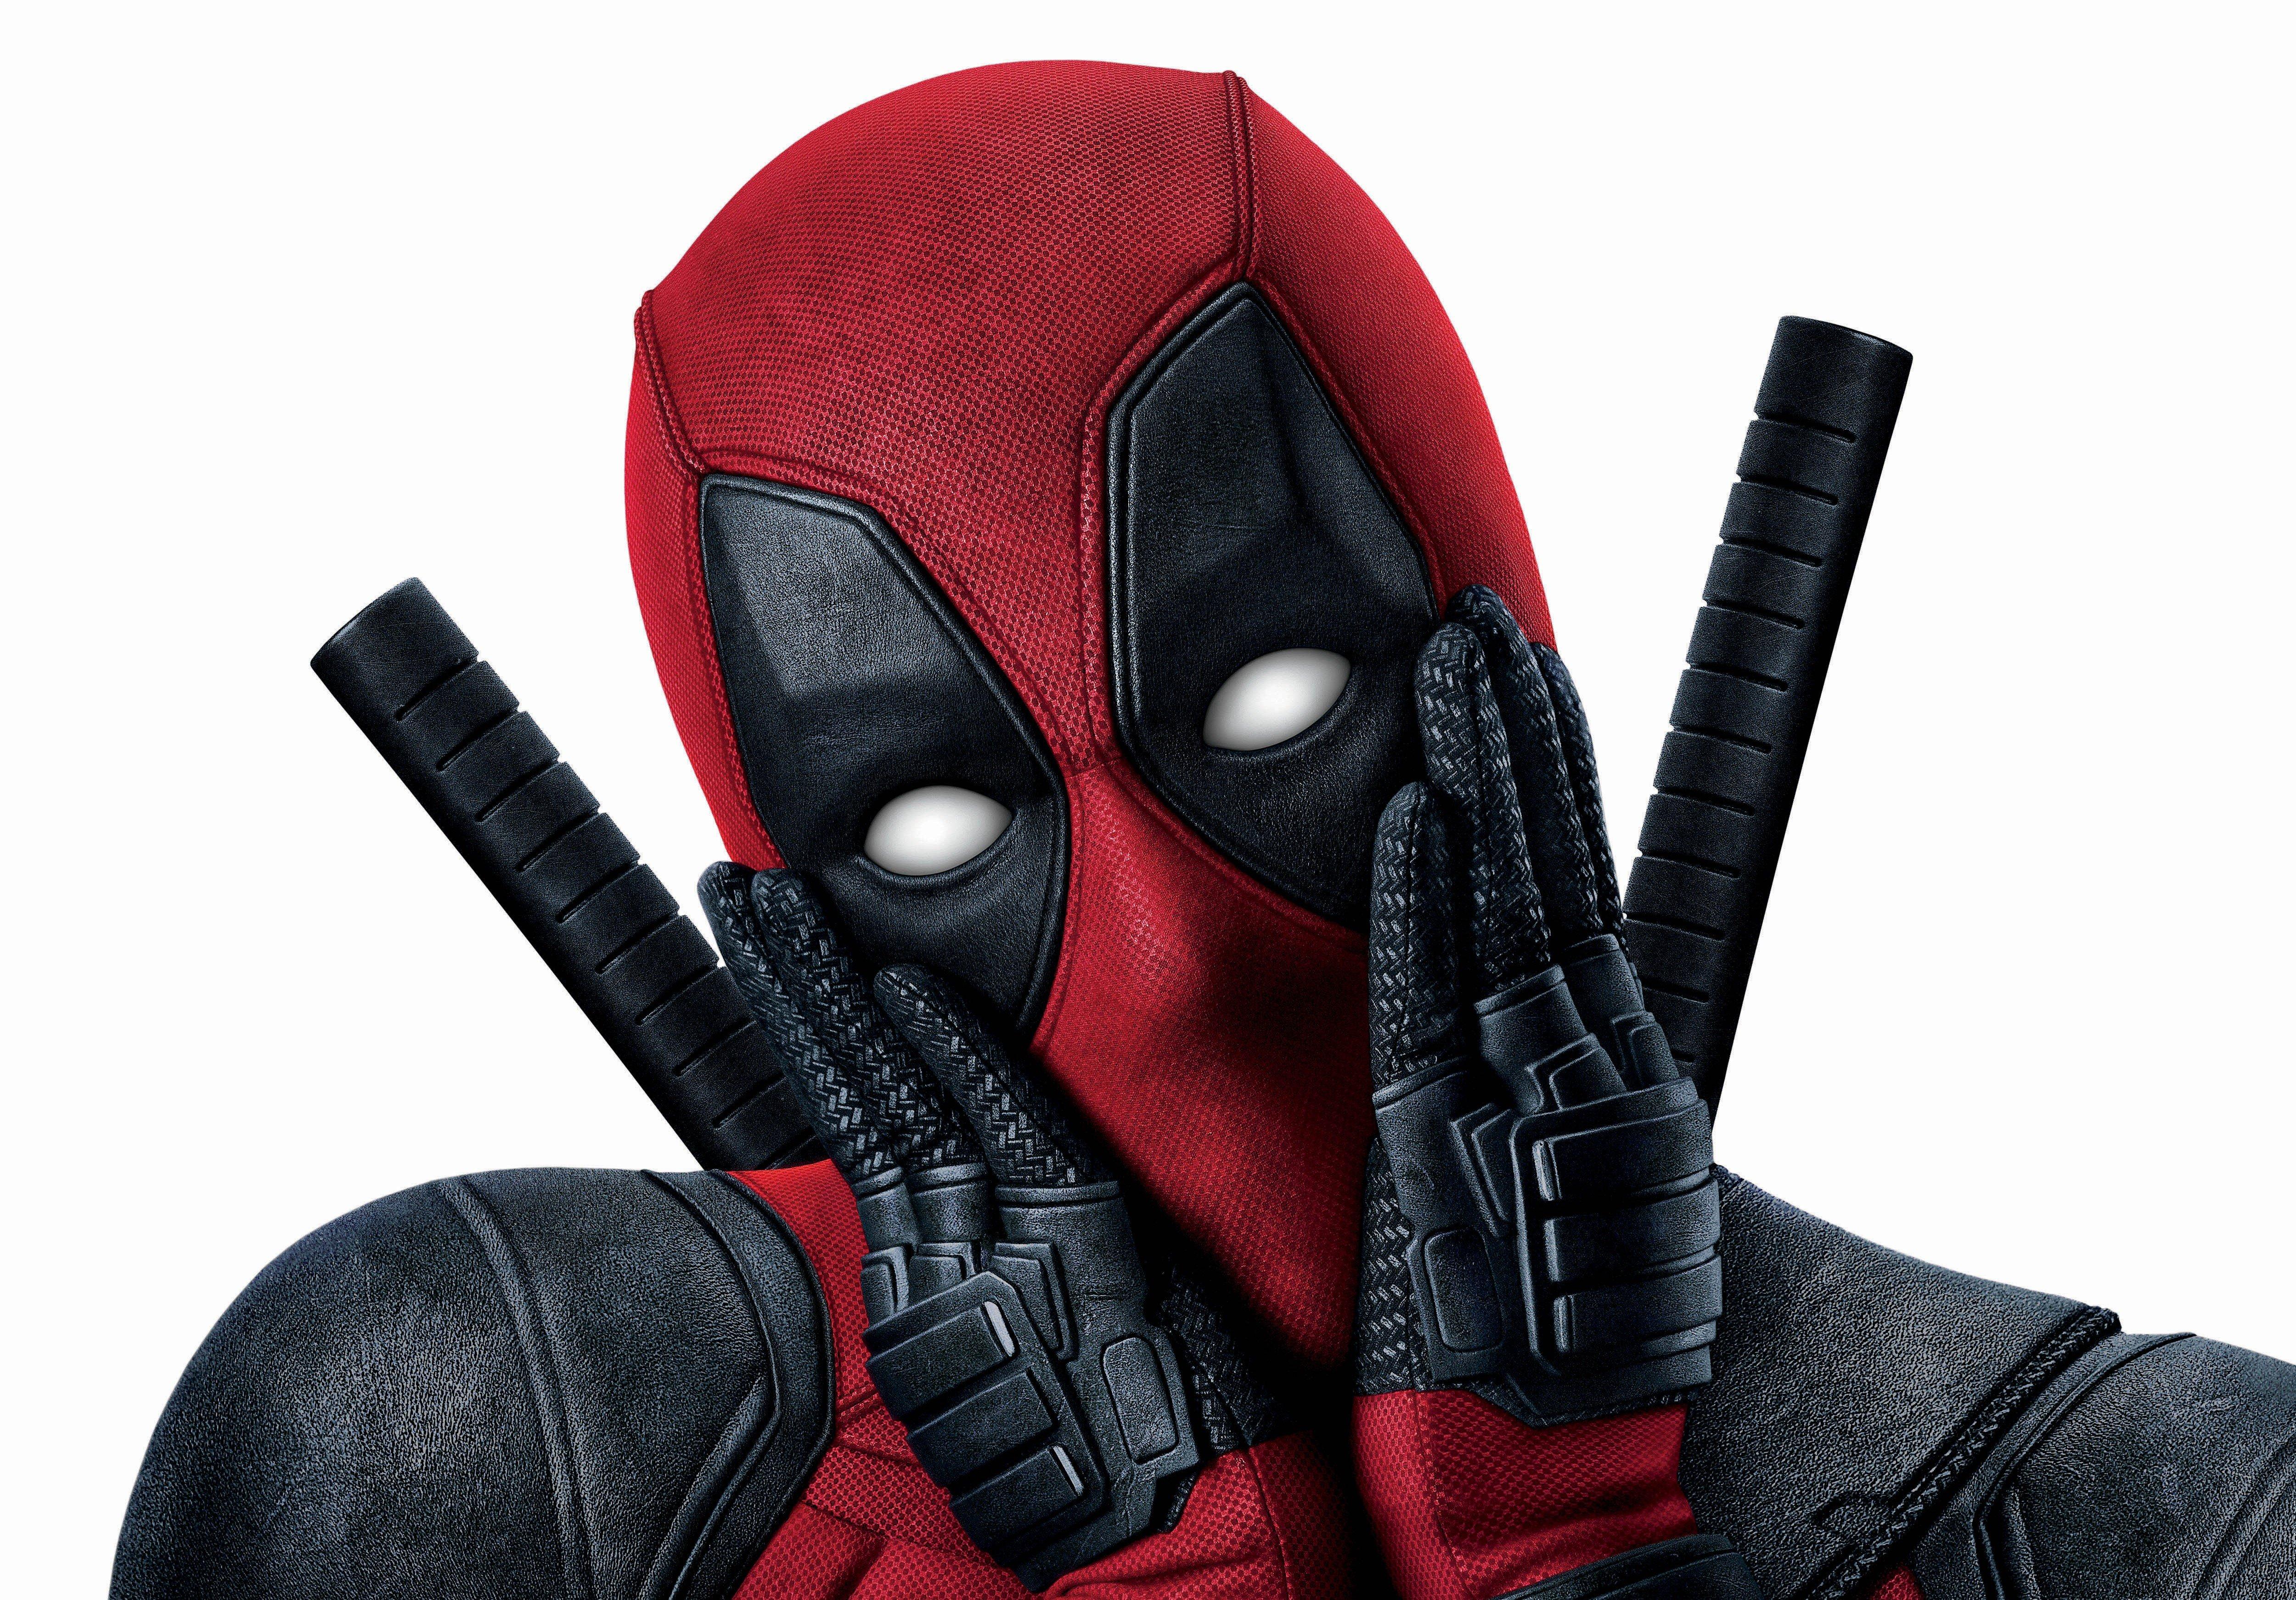 Wallpaper : Ryan Reynolds, Deadpool 2